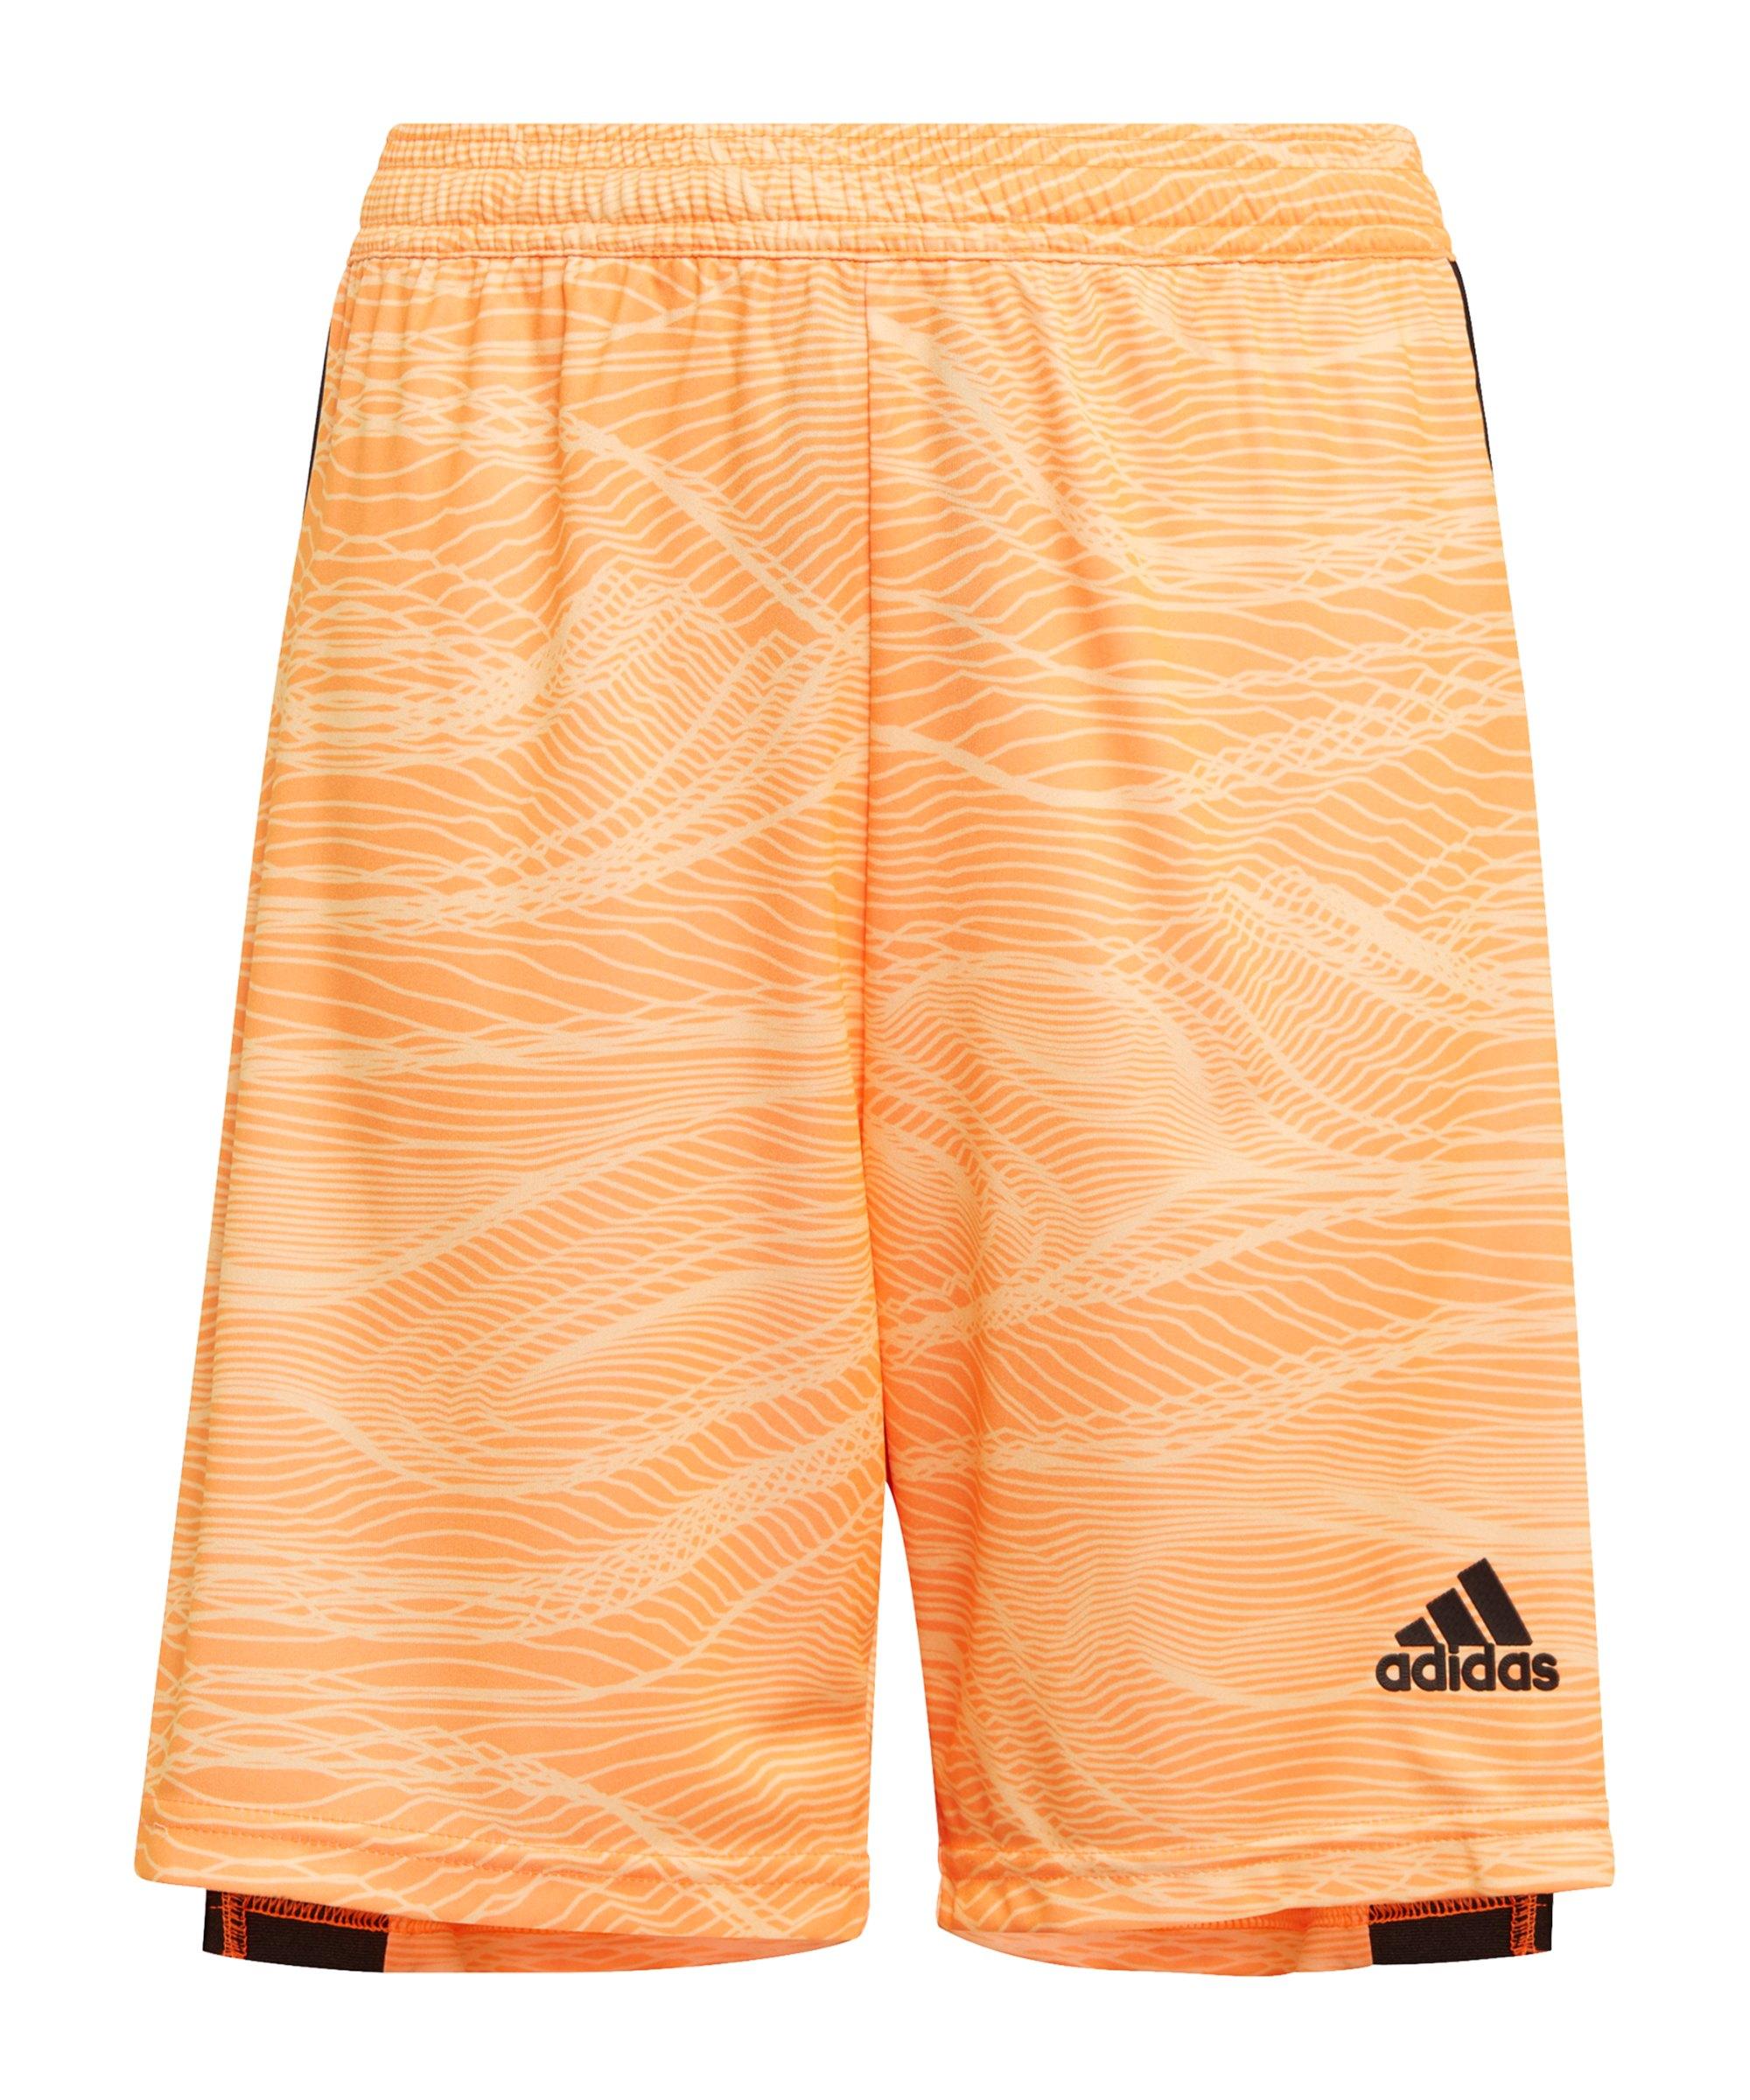 adidas Condivo 21 Torwartshort Kids Orange - orange